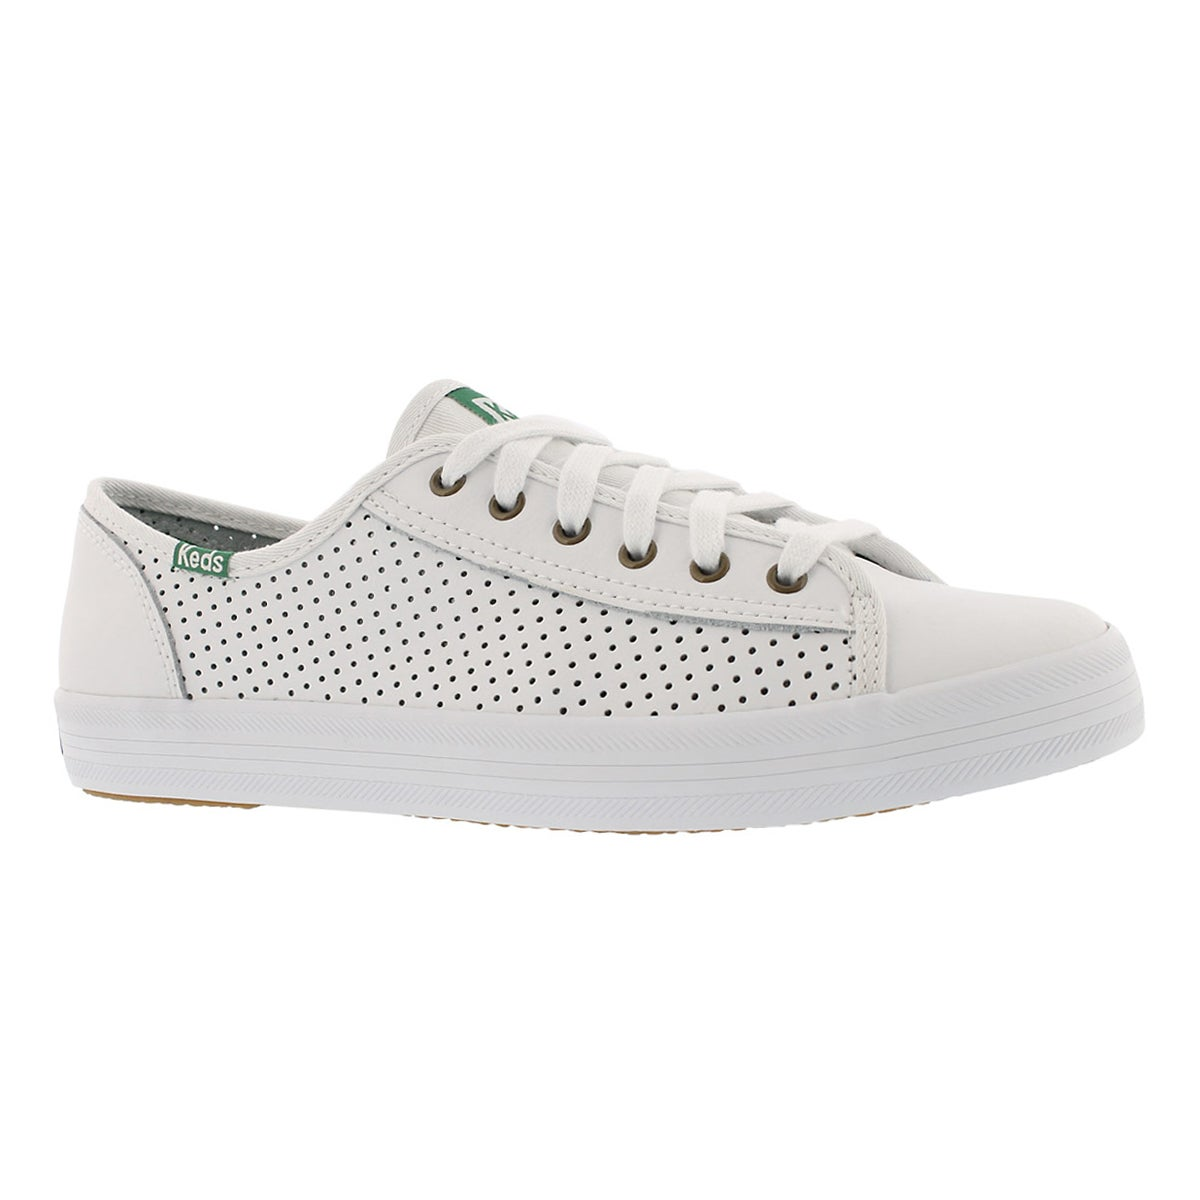 Women's KICKSTART RETRO perf white/green sneakers